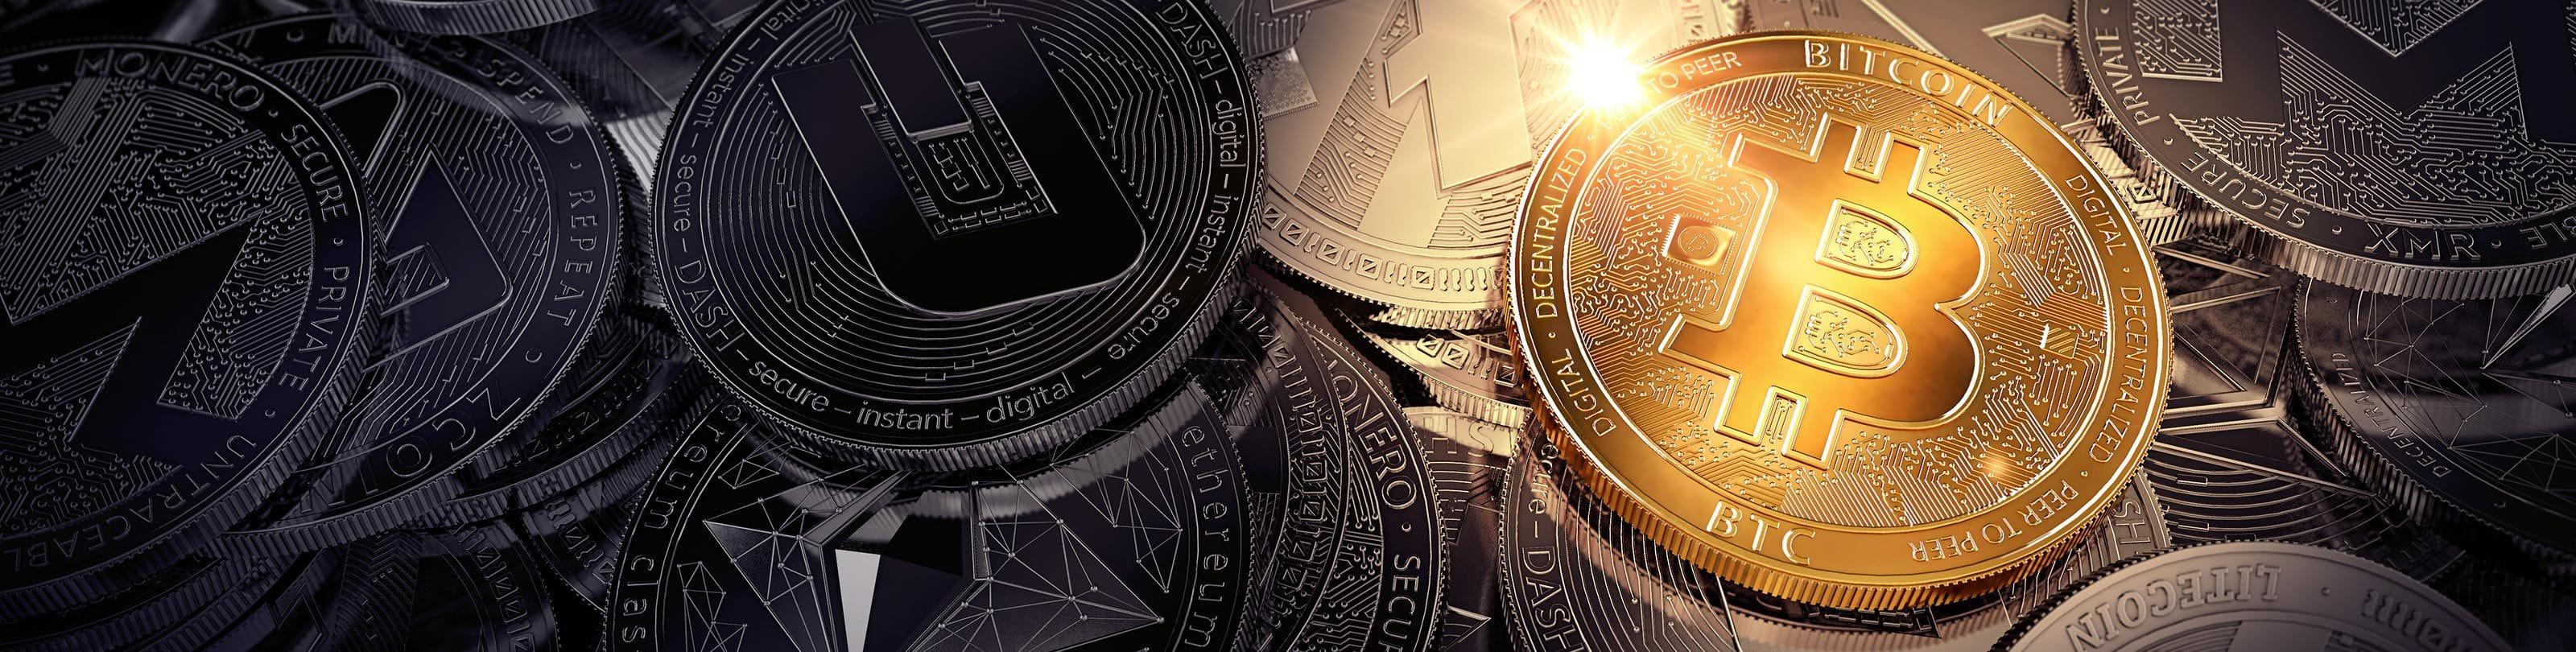 crypto baner